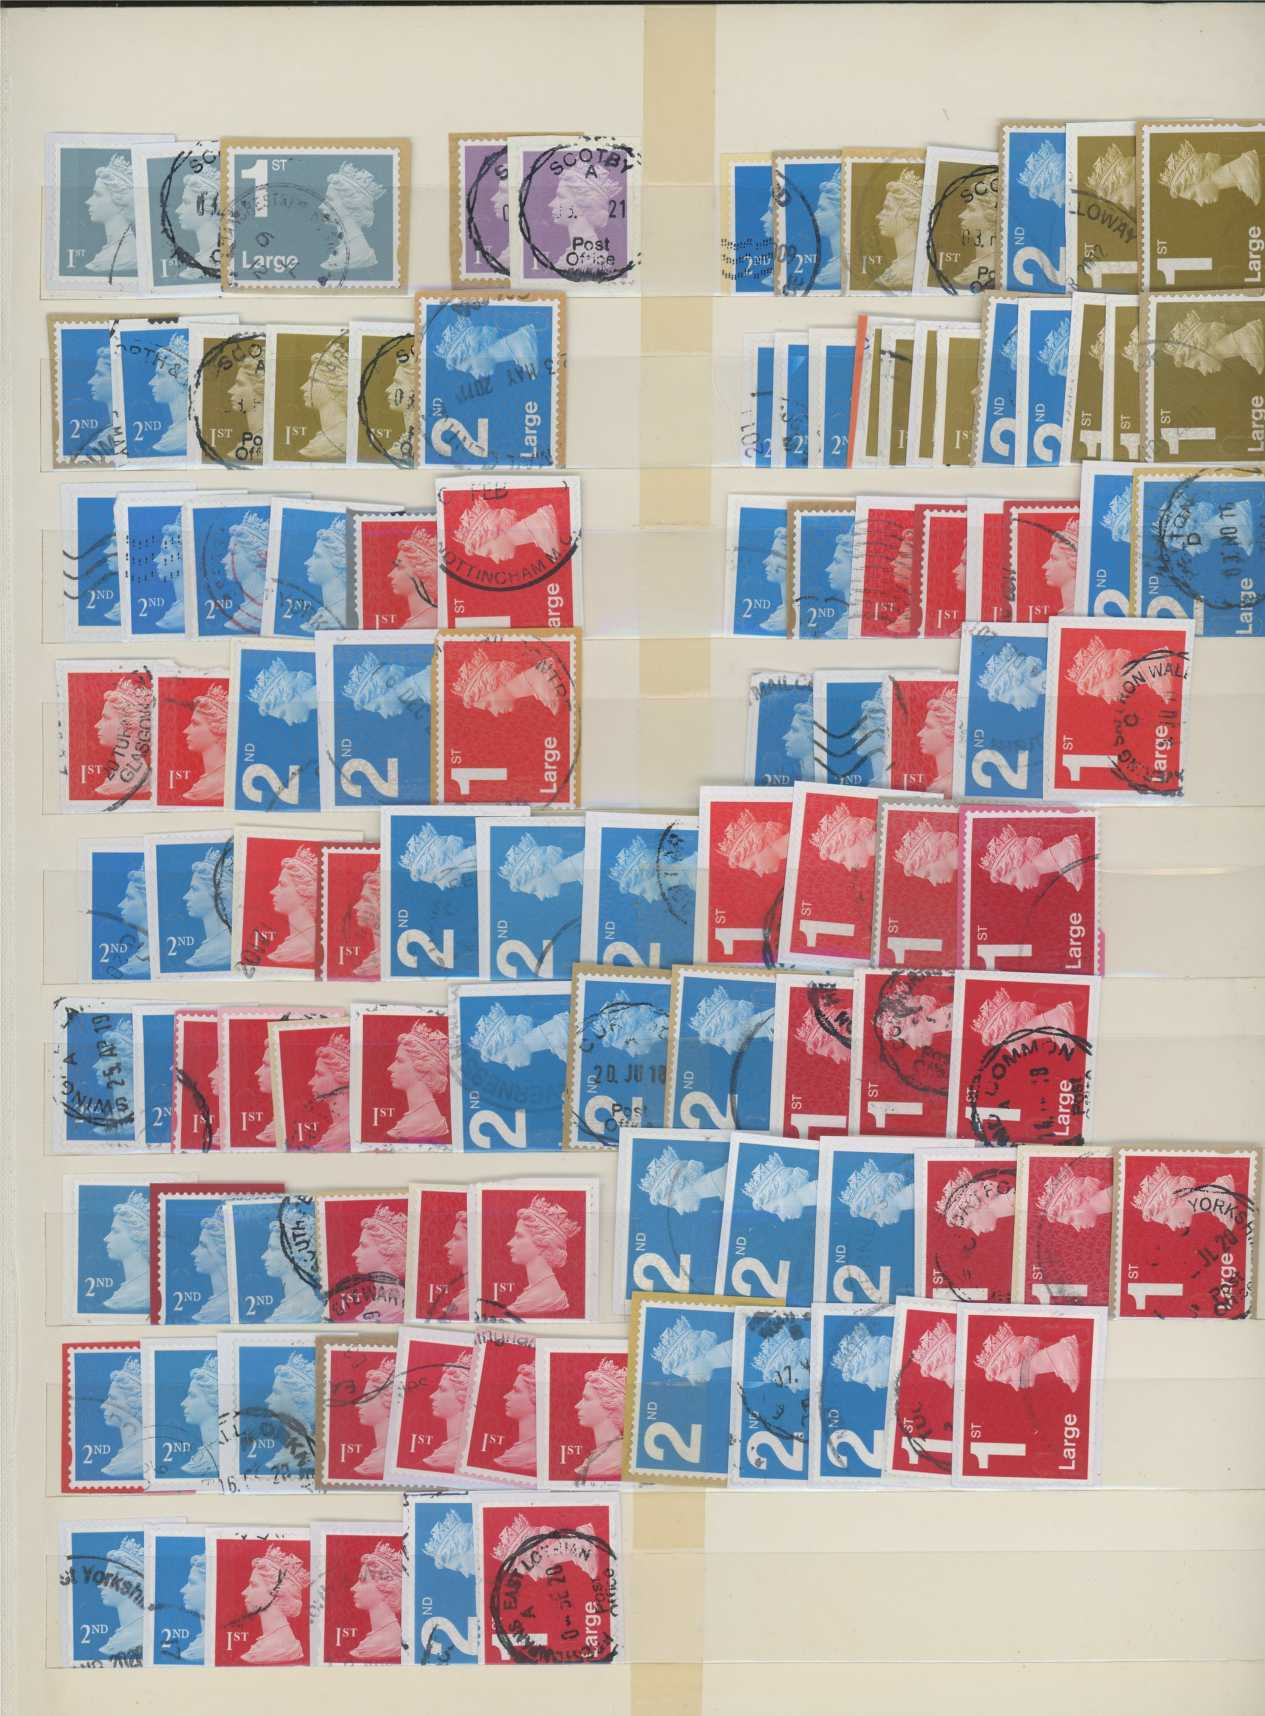 2009-2020 postally used Security Machins, nearly all F/U cds postmarks.